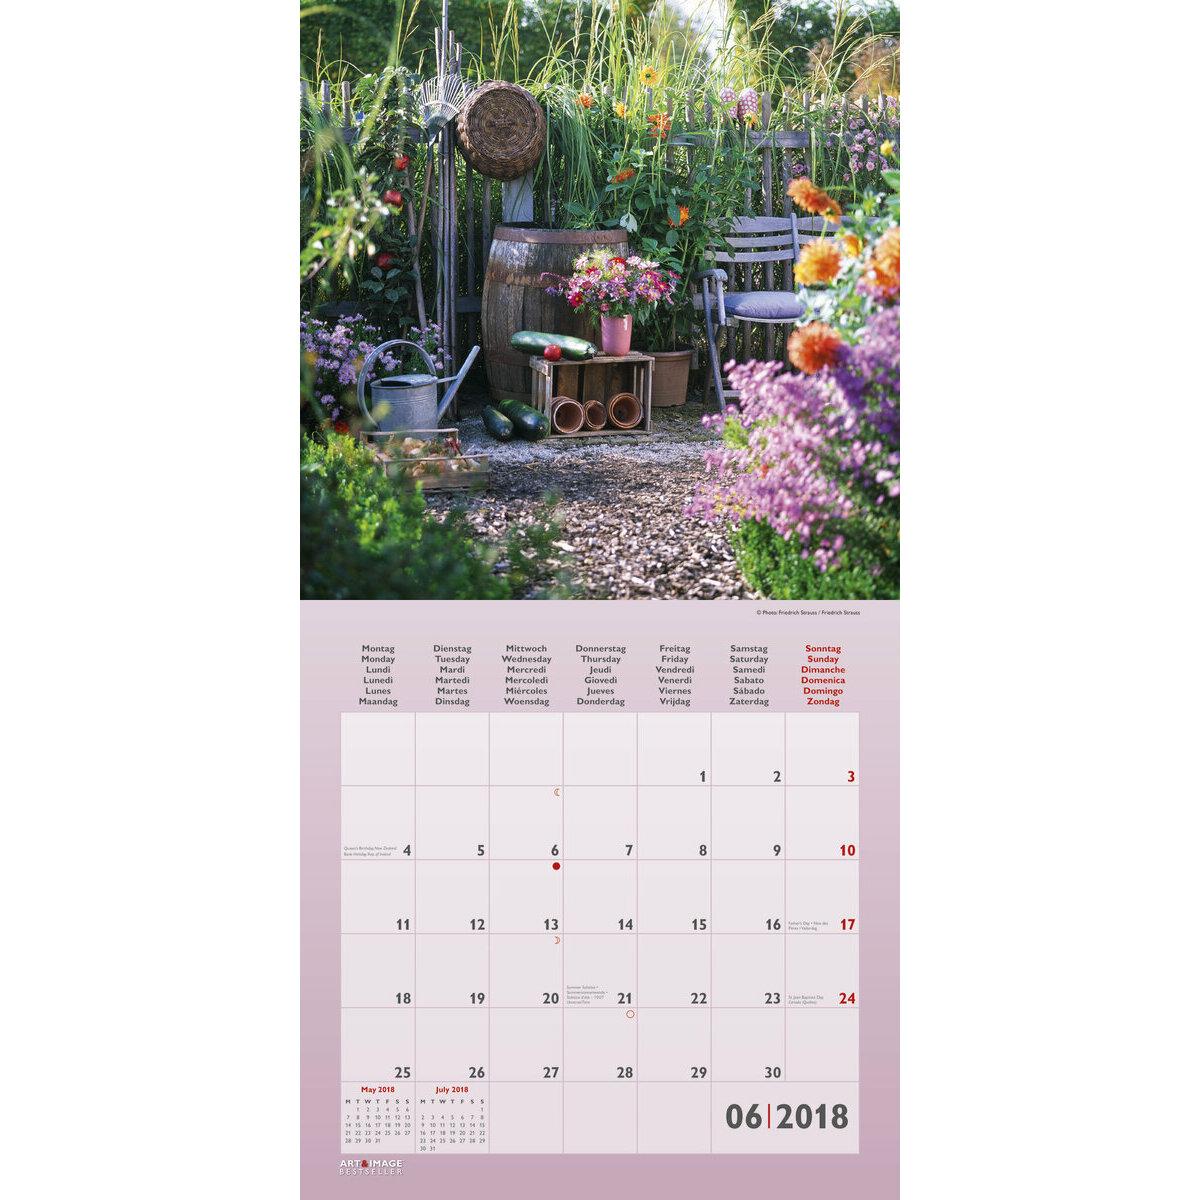 Calendrier 2018 d coration de jardin avec poster offert for Cendrier de jardin